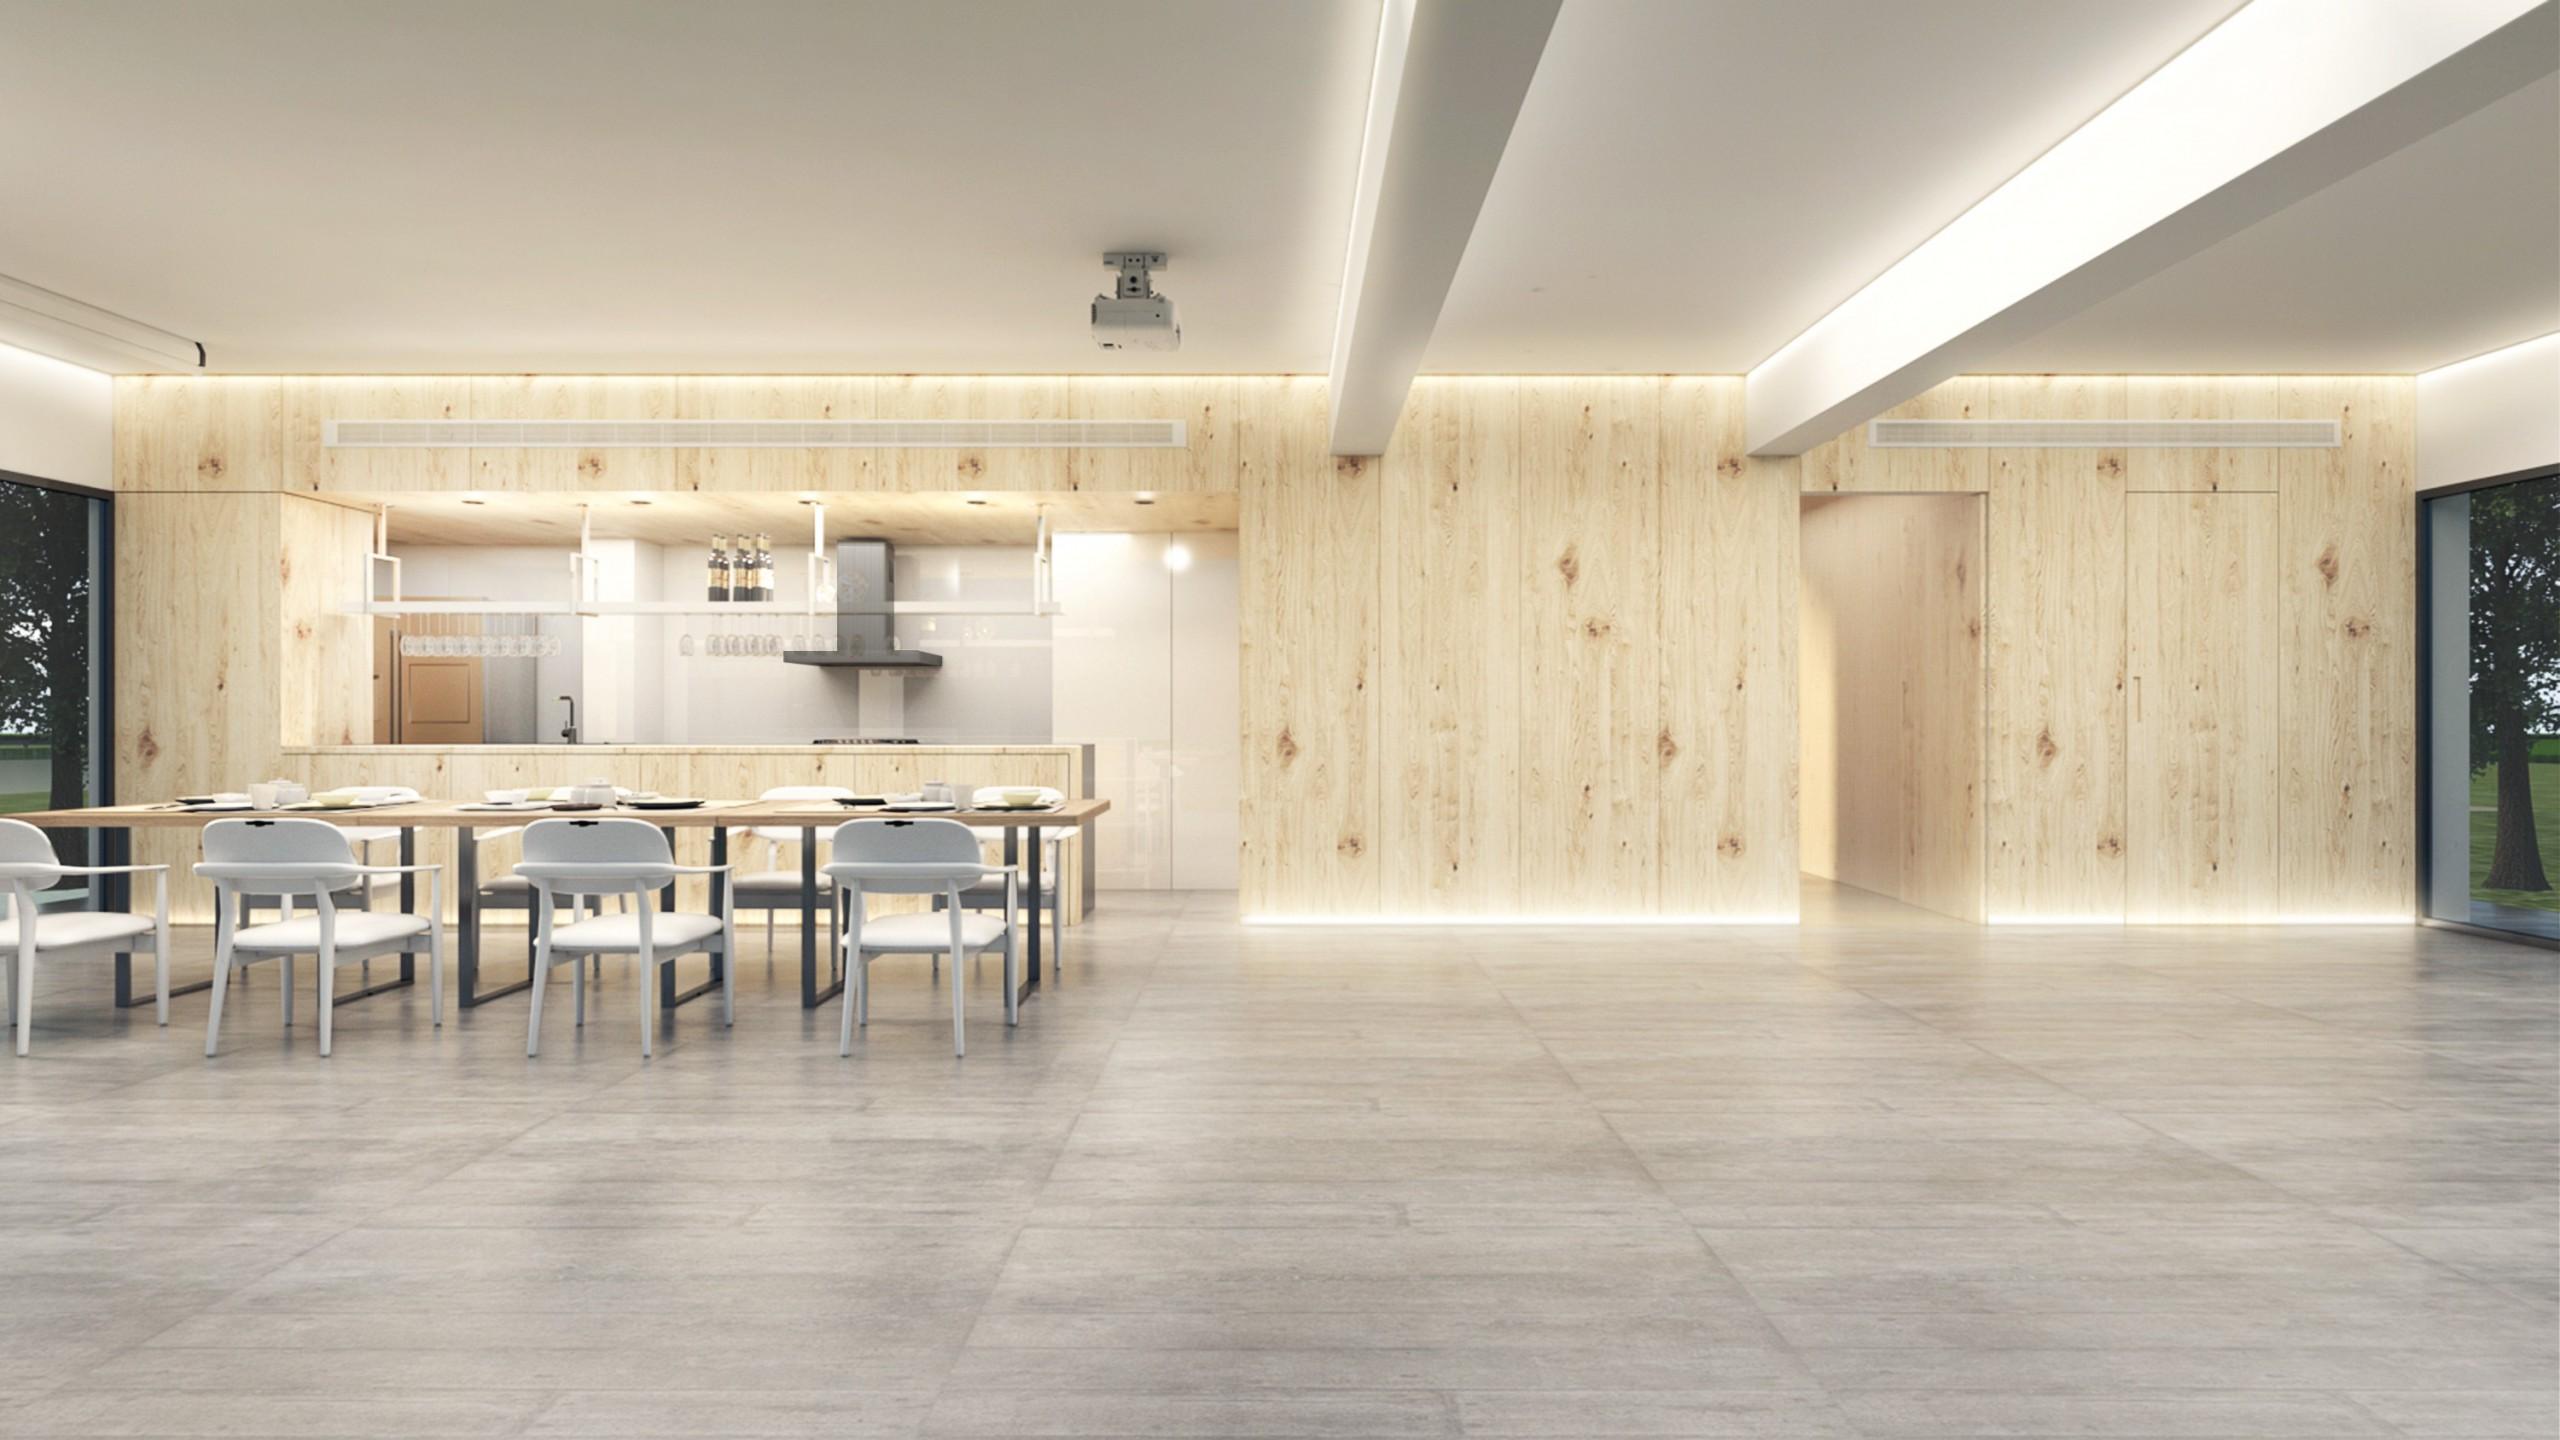 德築-DEZU-project-日光綠築-architecture-interior-3Drendering-1